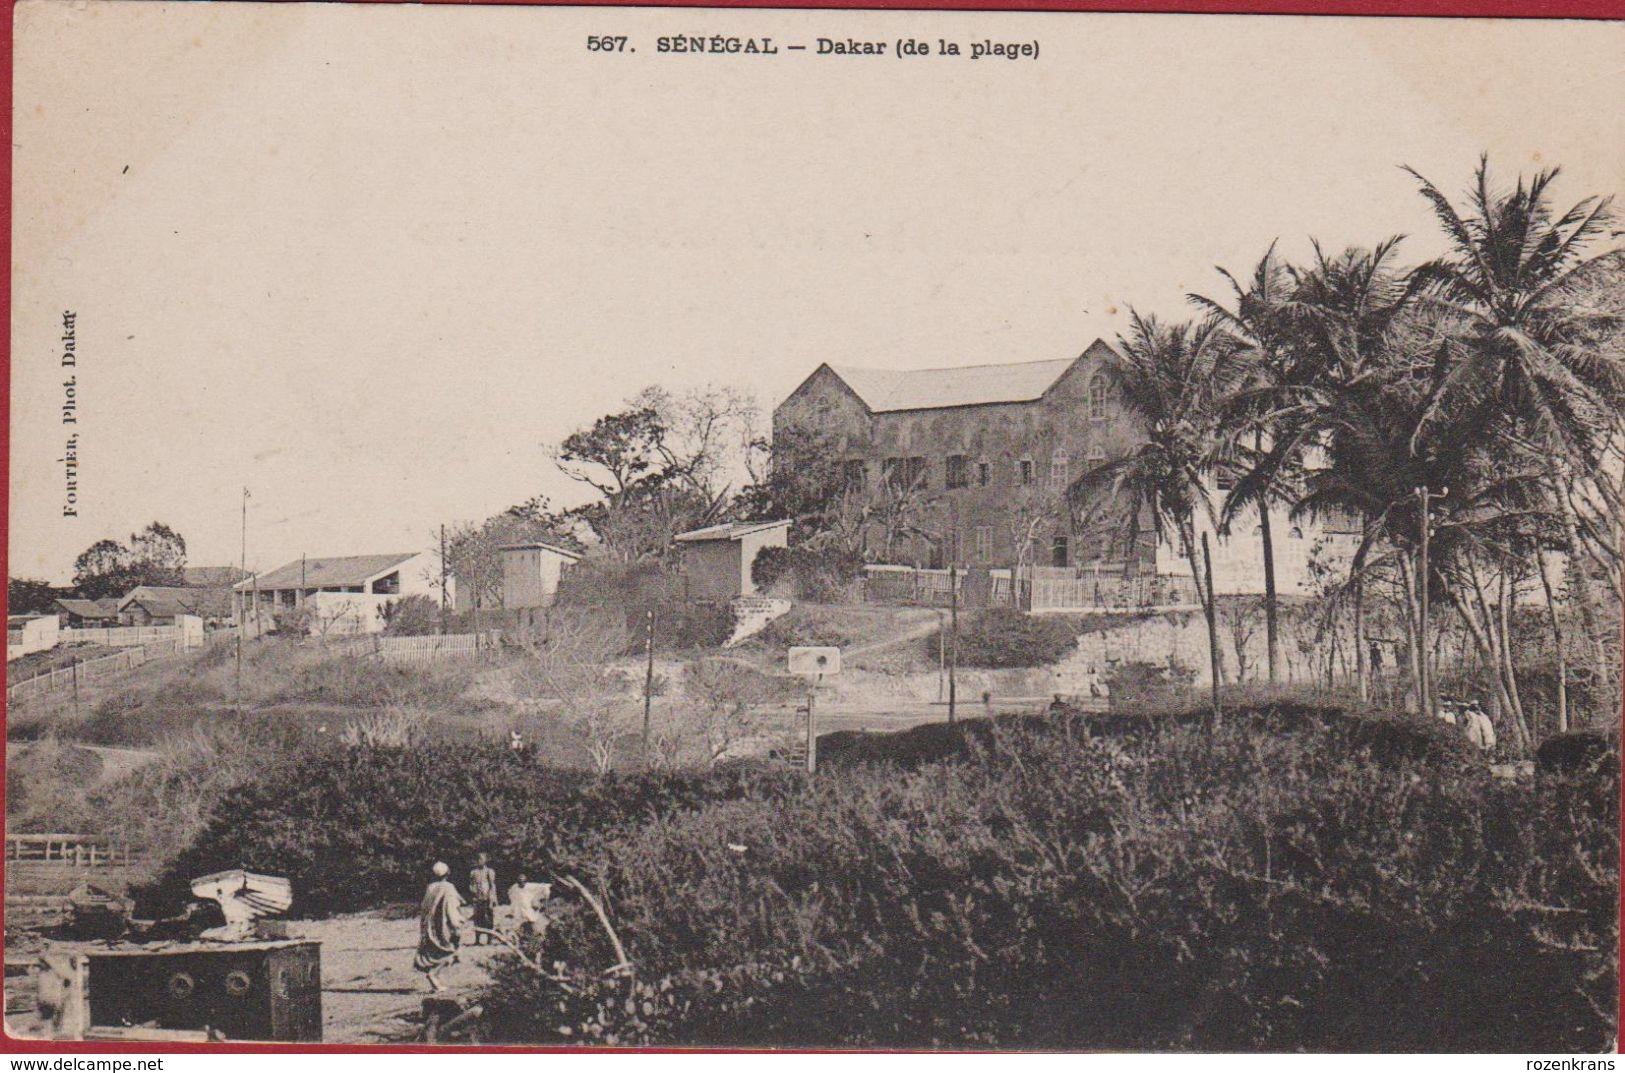 SENEGAL Dakar (de La Plage) Edit Fortier Phot Dakar - Afrika Afrique Africa - Sénégal